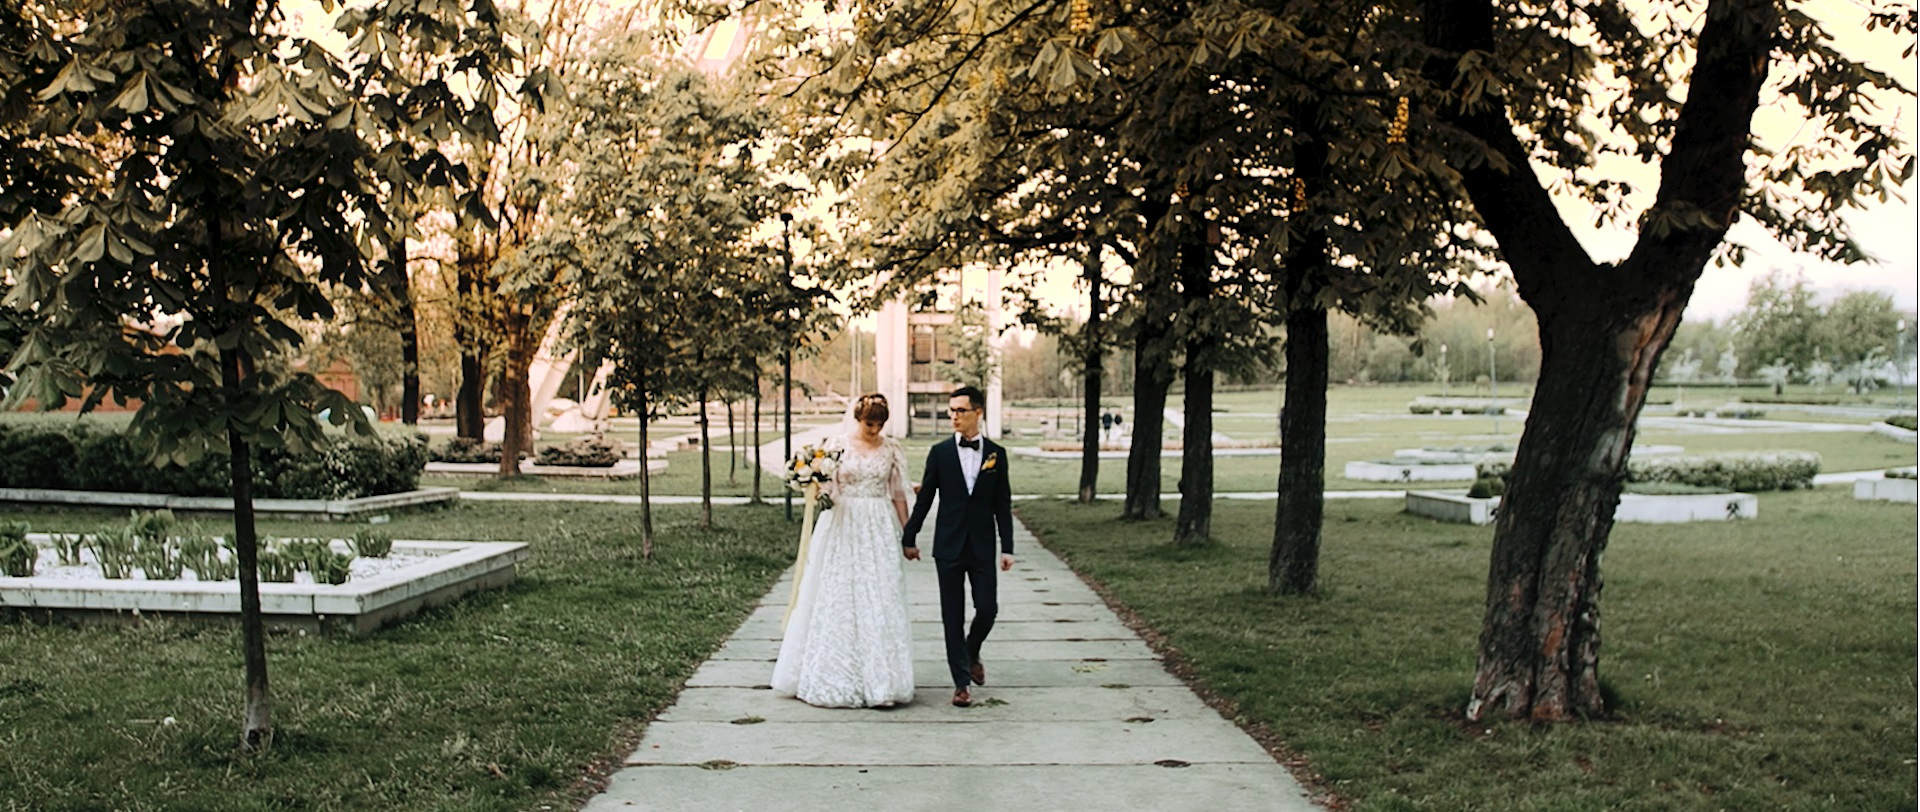 plener ślub wesele śląsk plenerowy katowice